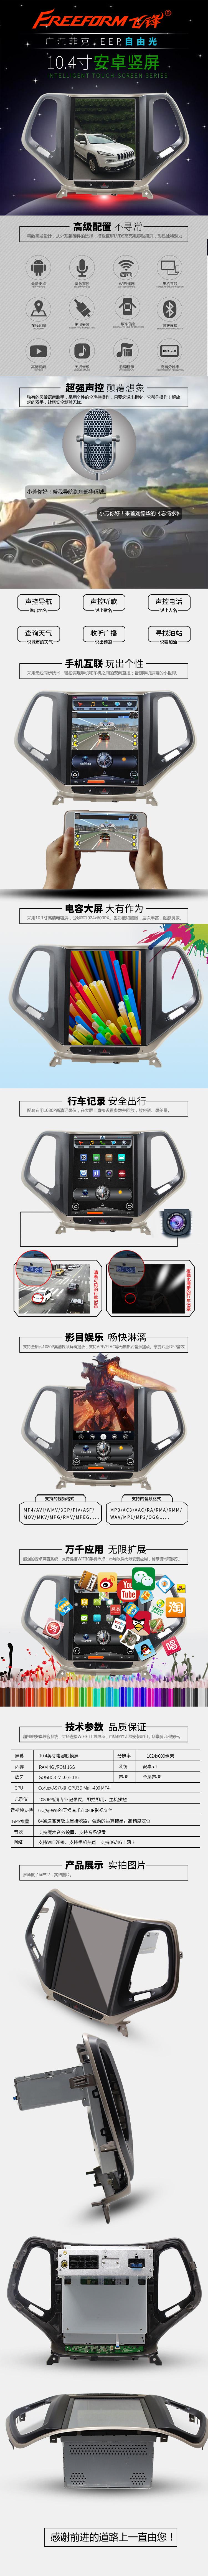 FD-5009广汽菲克自由光15款详情页.jpg